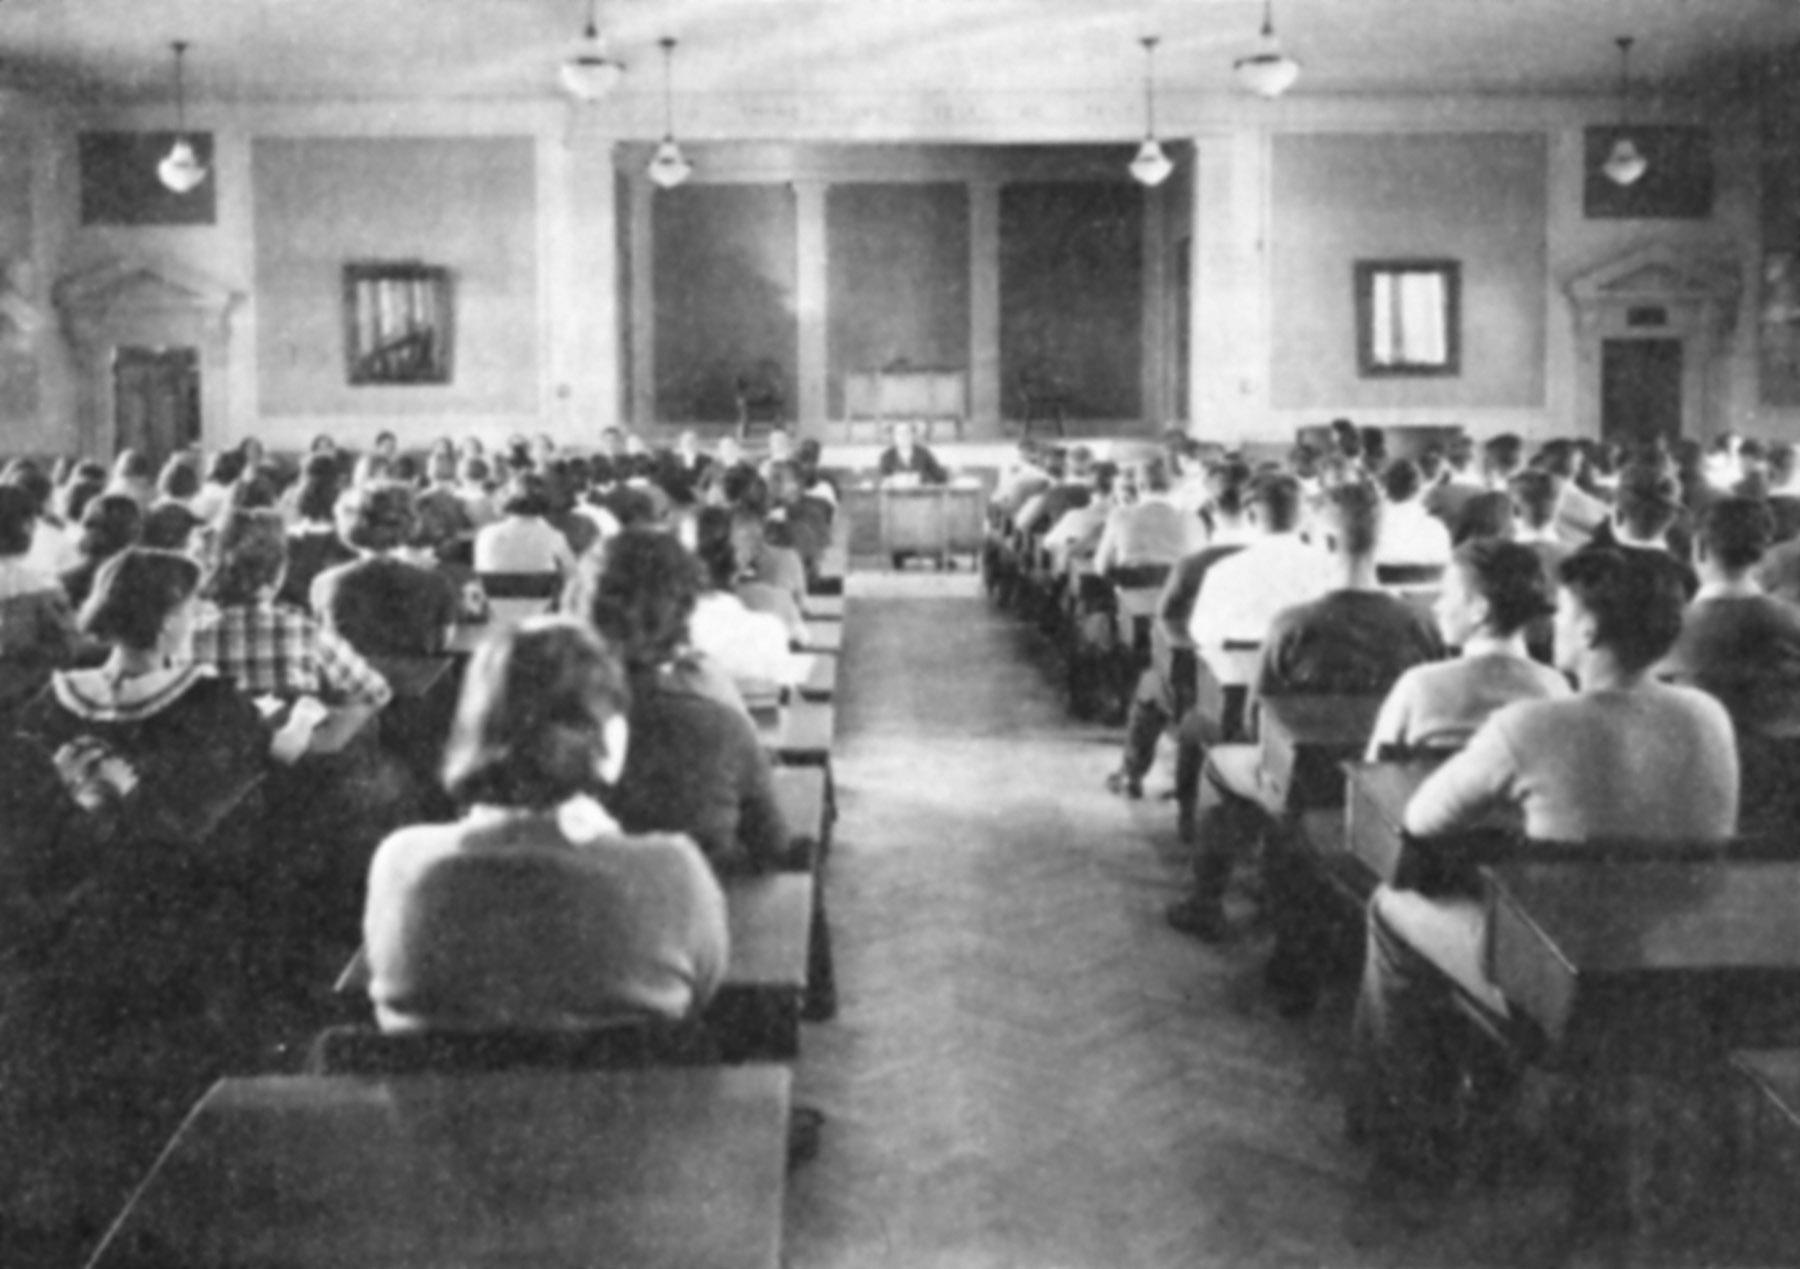 Q2 Hanscom 1st floor 1934 study hall.jpg